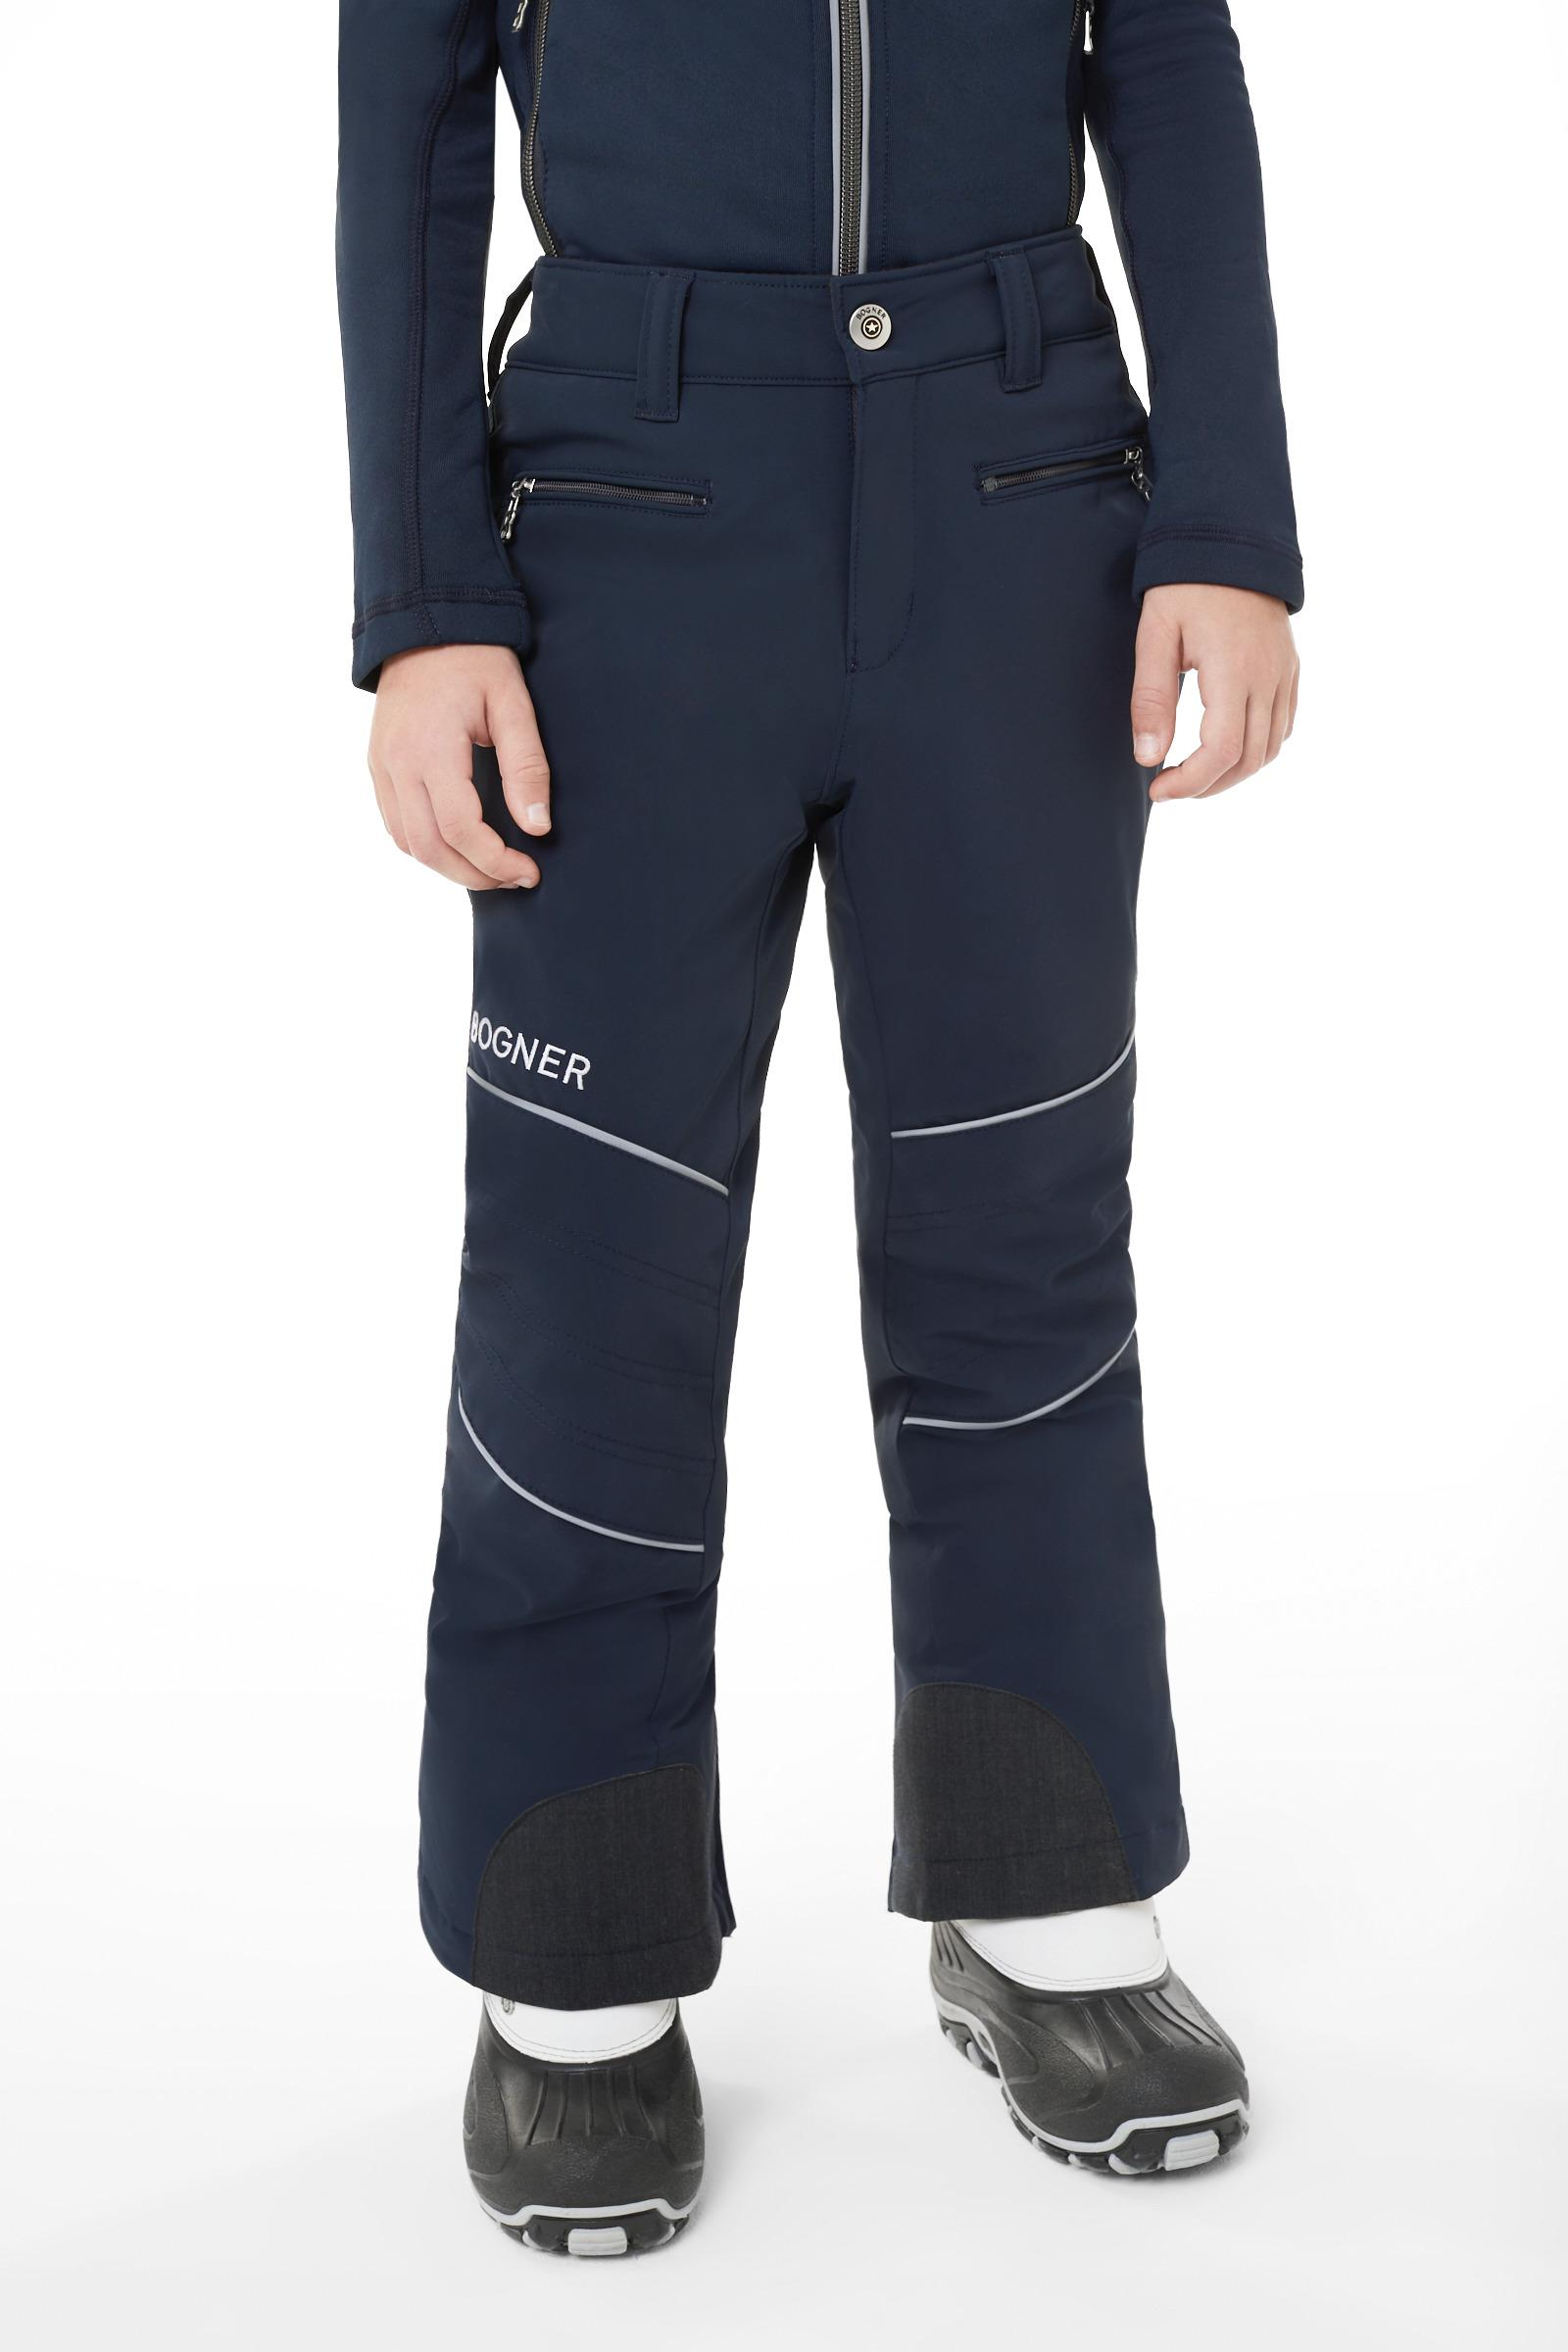 Lyst - Bogner Bekki Ski Pants In Navy Blue in Blue ffc1091e0